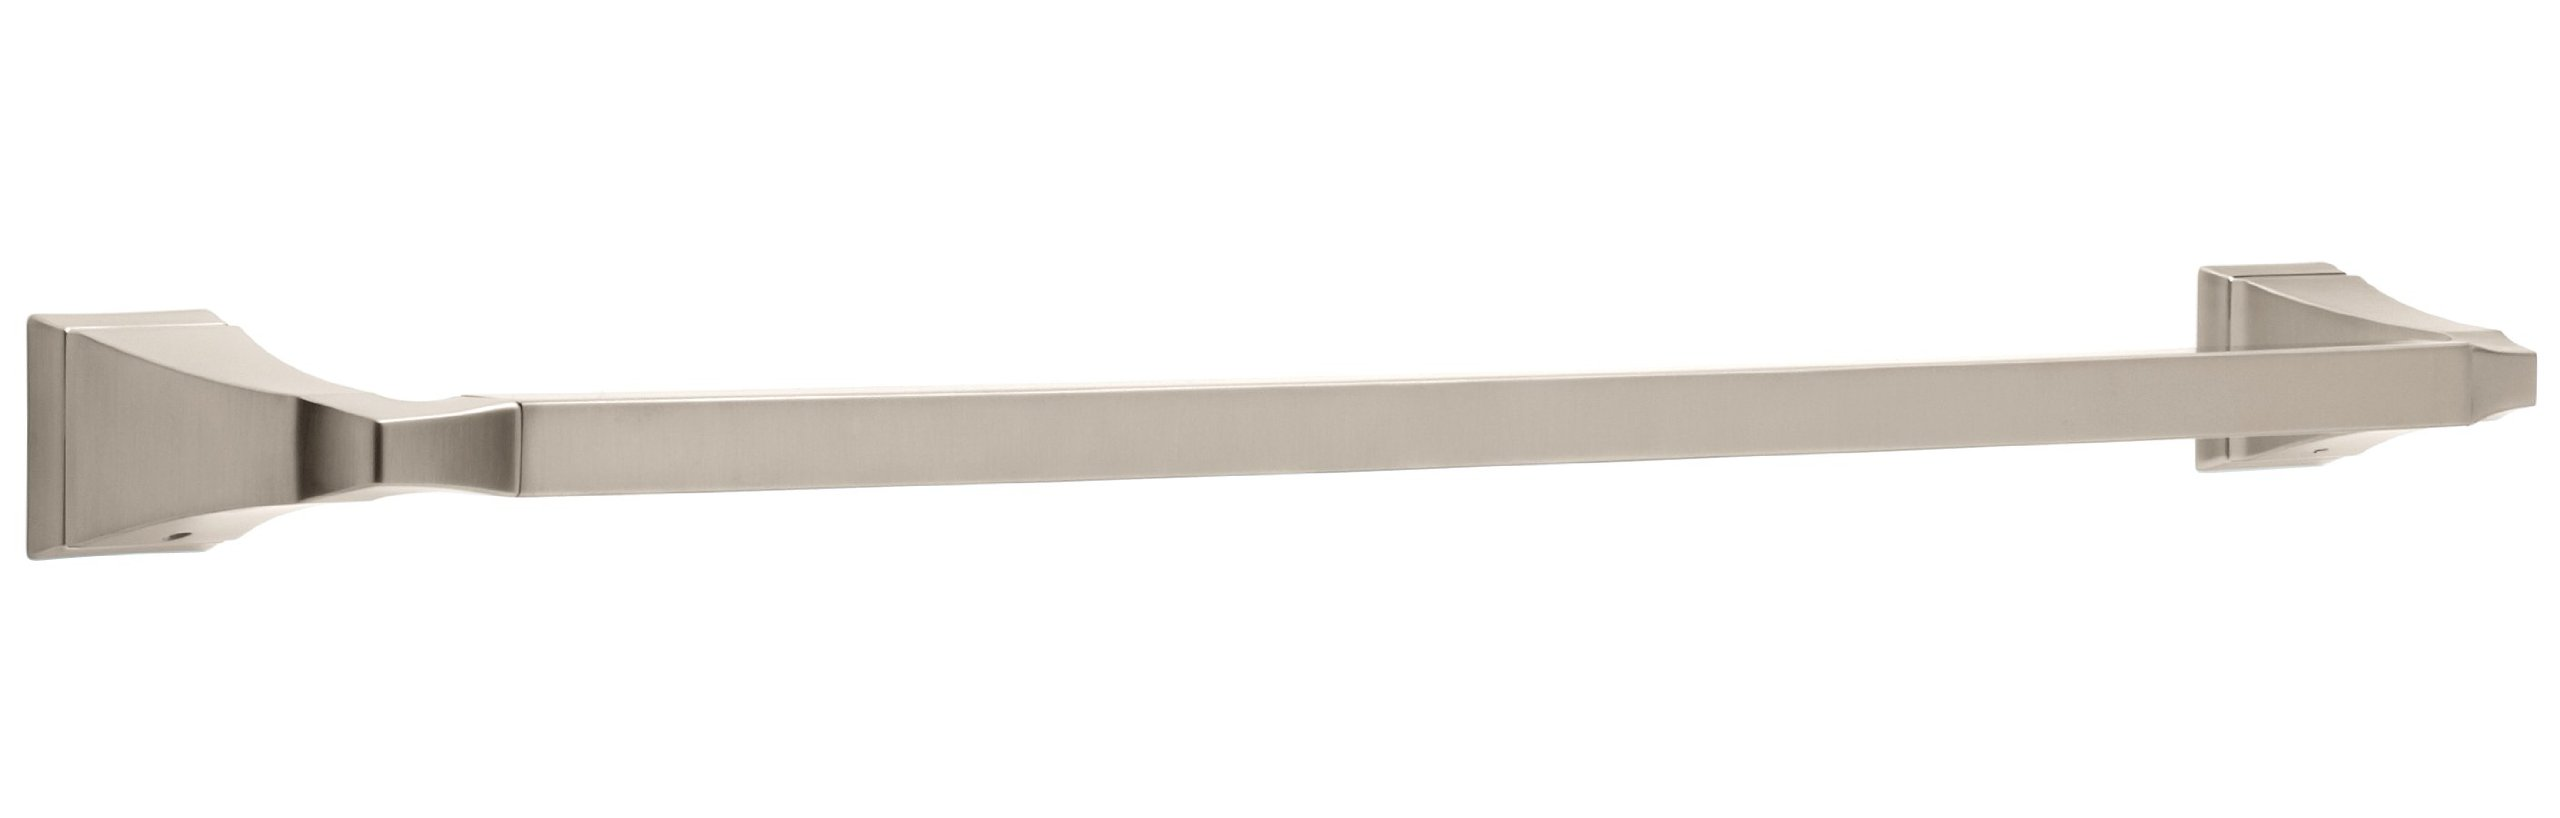 Delta Faucet 128889 Dryden 24'' Towel Bar, Brilliance Stainless Steel